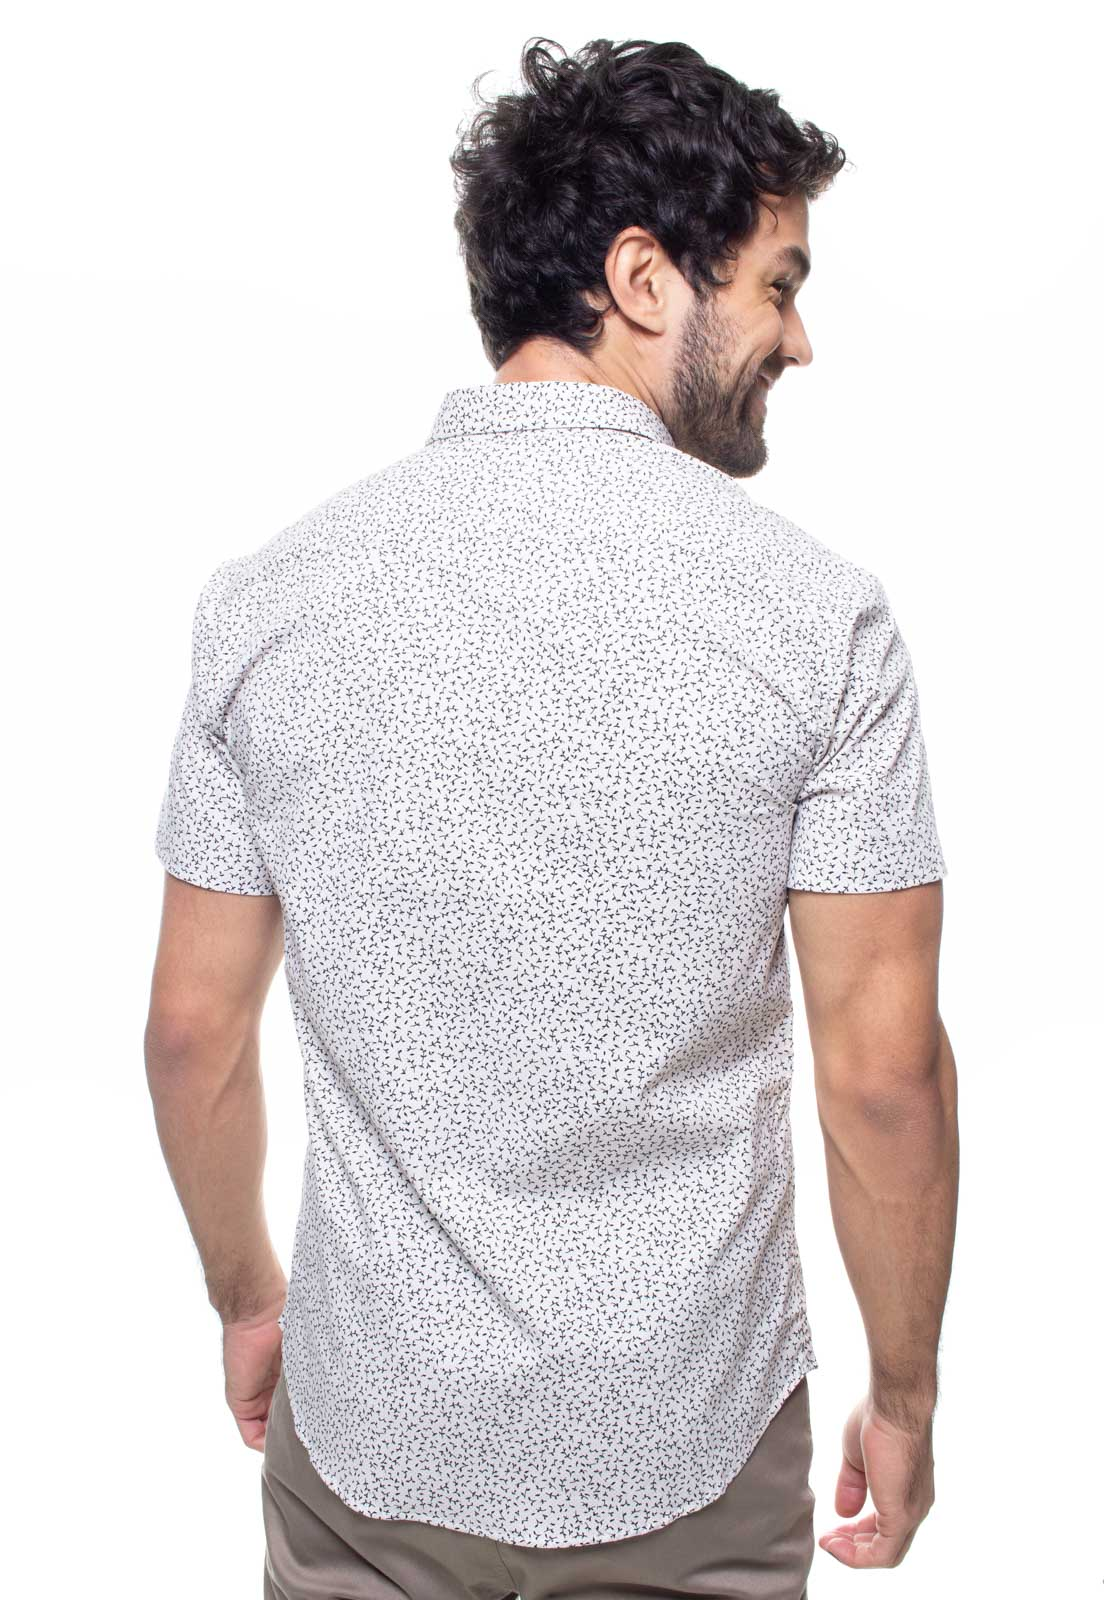 Camisa Estampada Masculina Manga Curta Crocker -  47933  - CROCKER JEANS